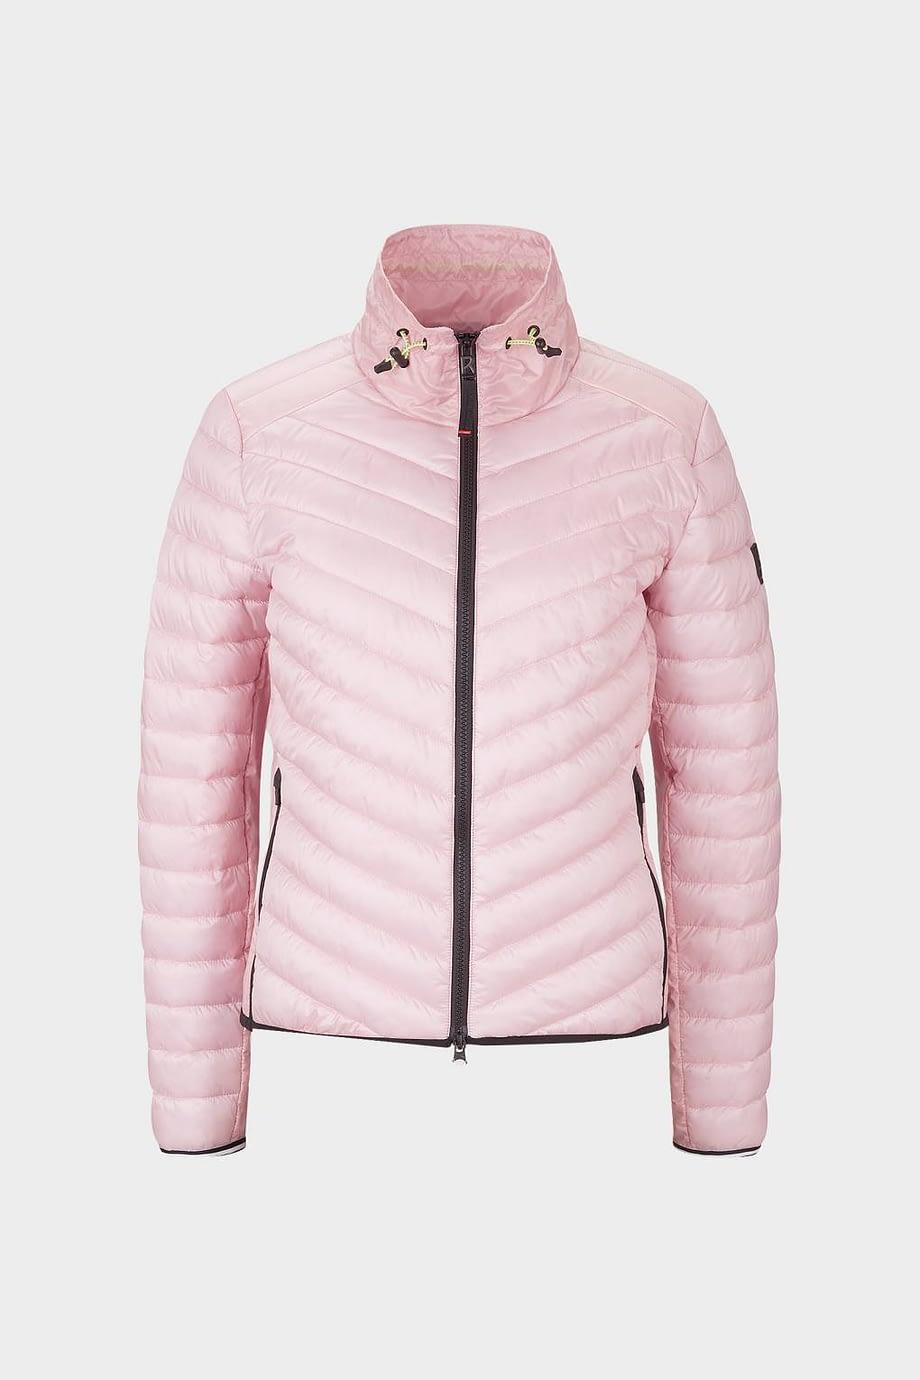 MASHA-QUILTED-JACKET-pink4